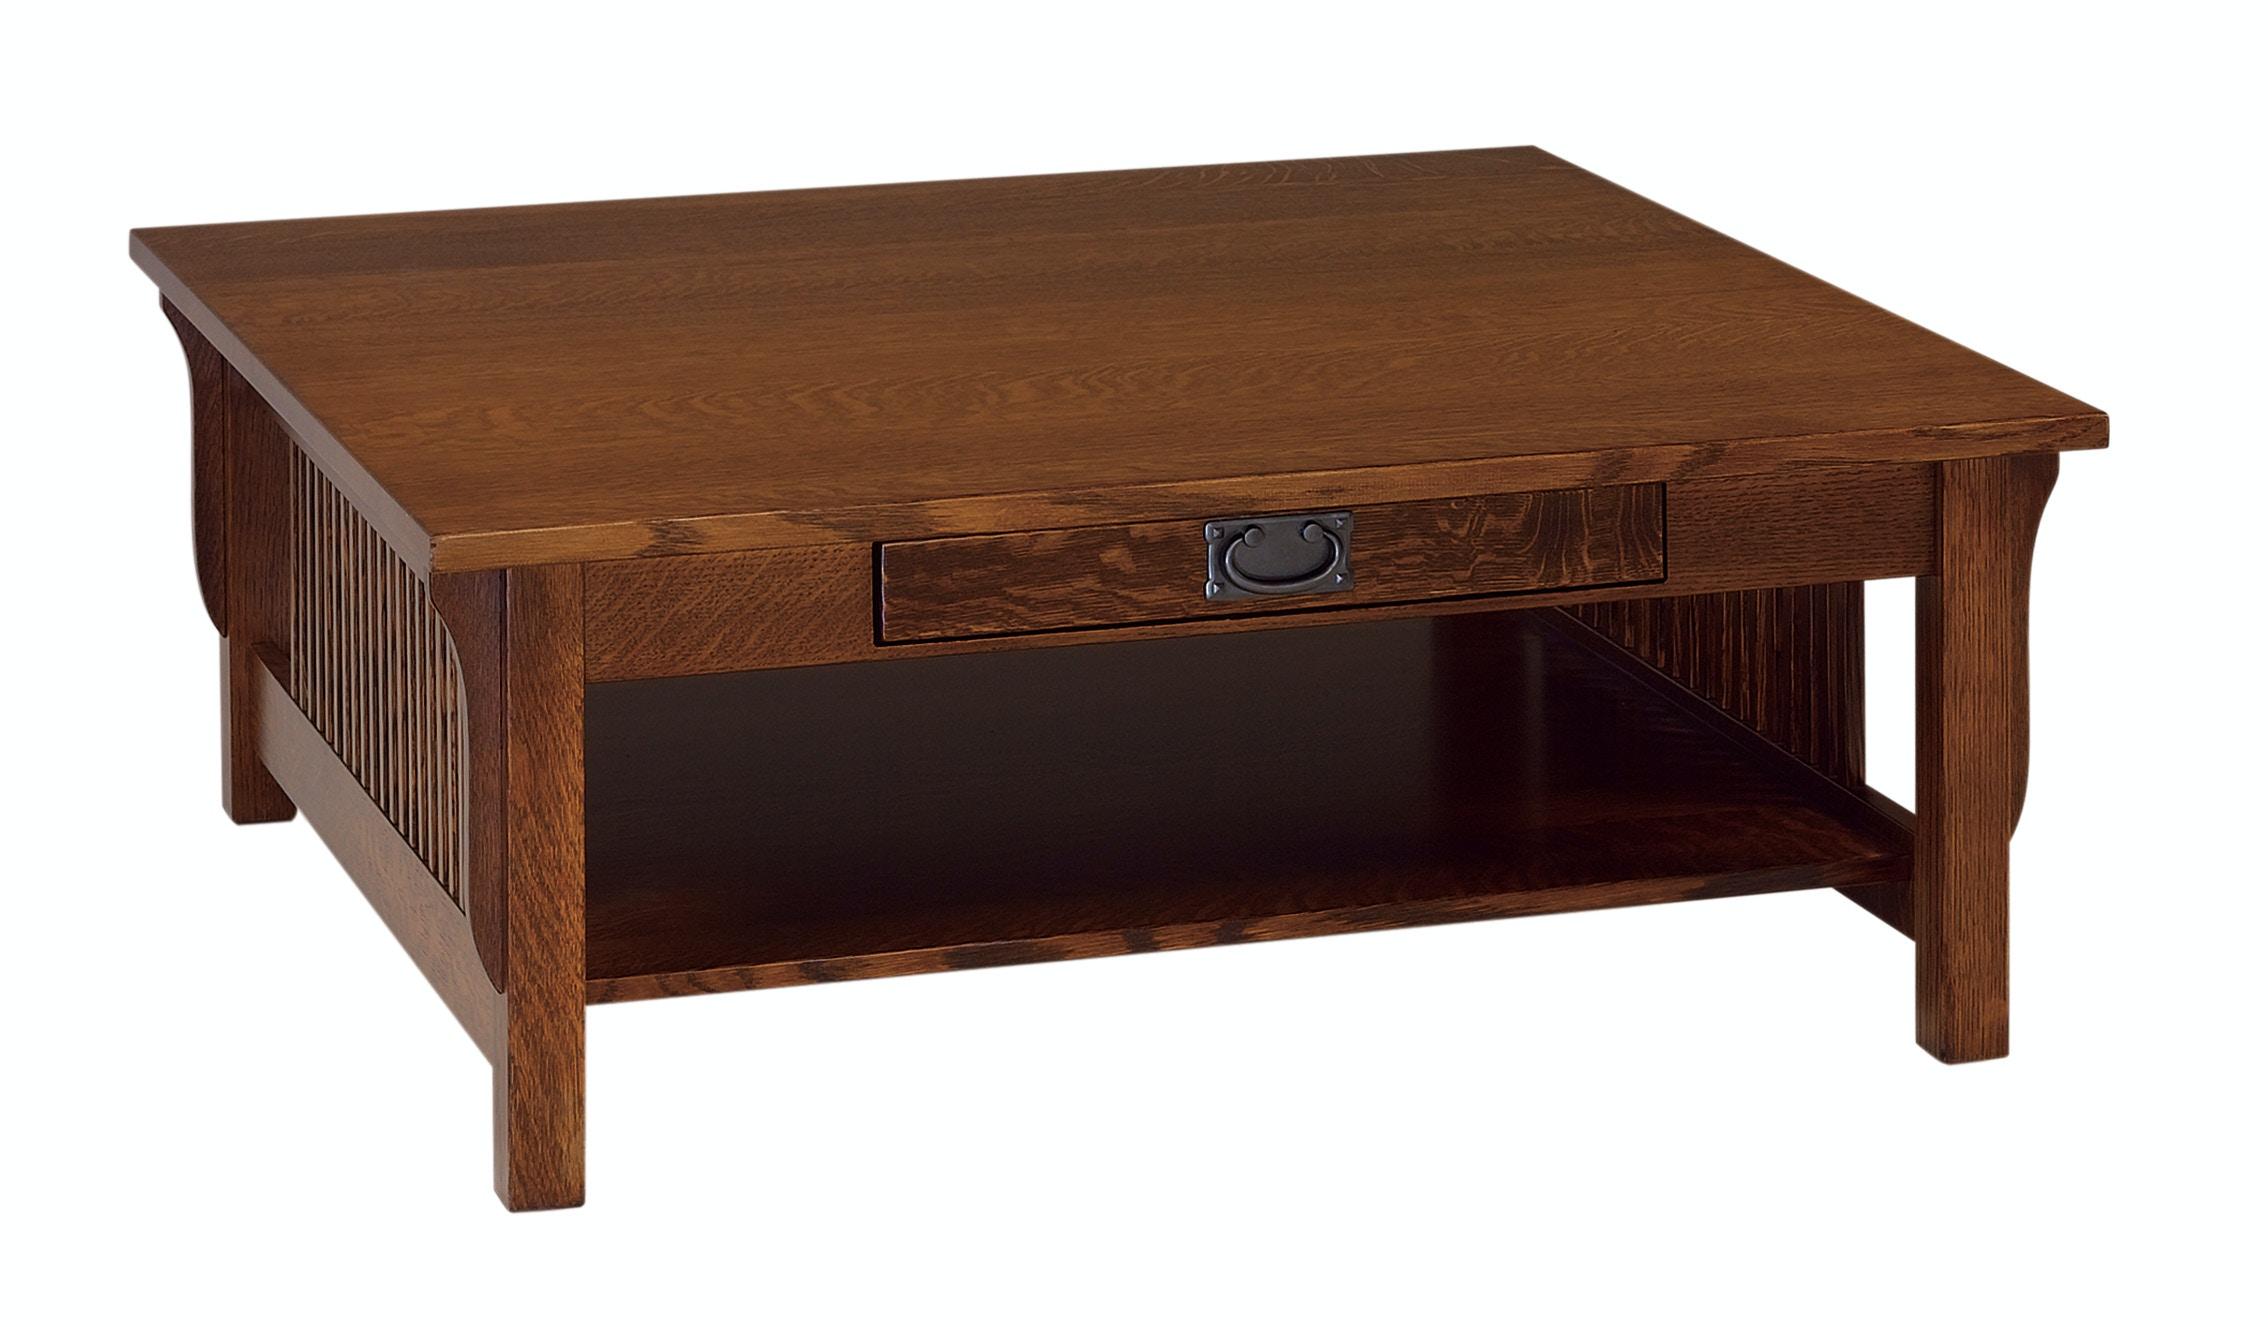 Crystal Valley Hardwoods Landmark Mission Style Coffee Table CF LM2848C